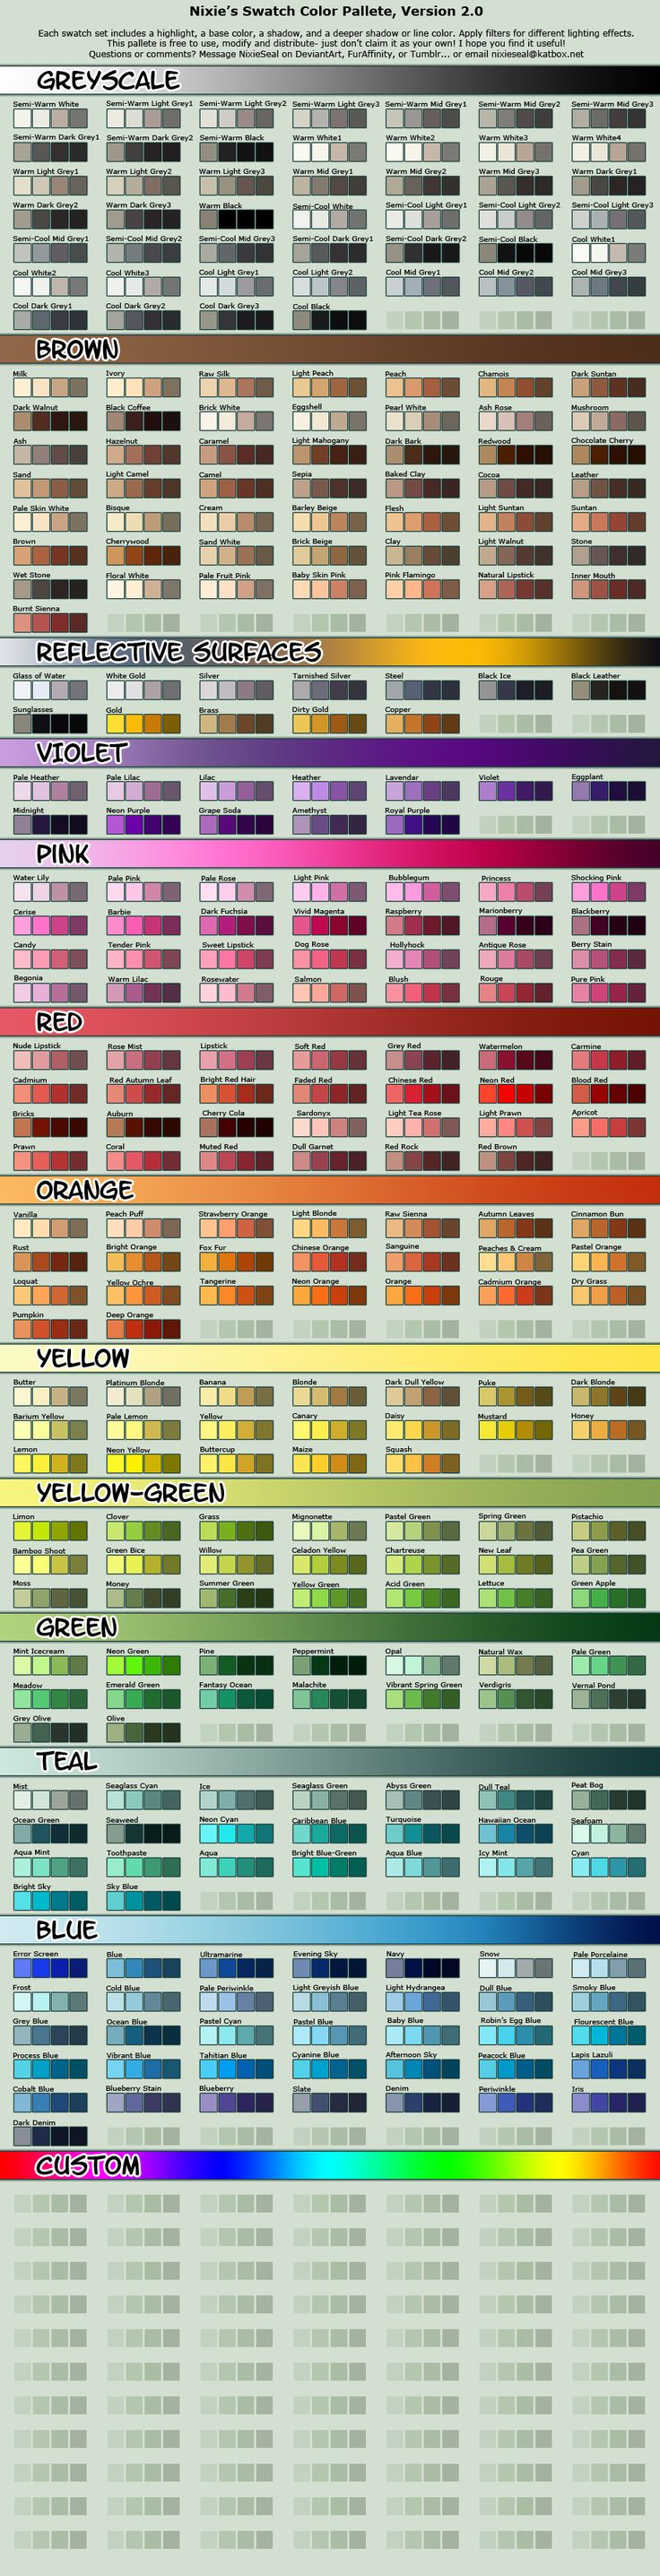 Vibrant Cell-shading Swatch Pallete by NixieSeal.deviantart.com on @deviantART